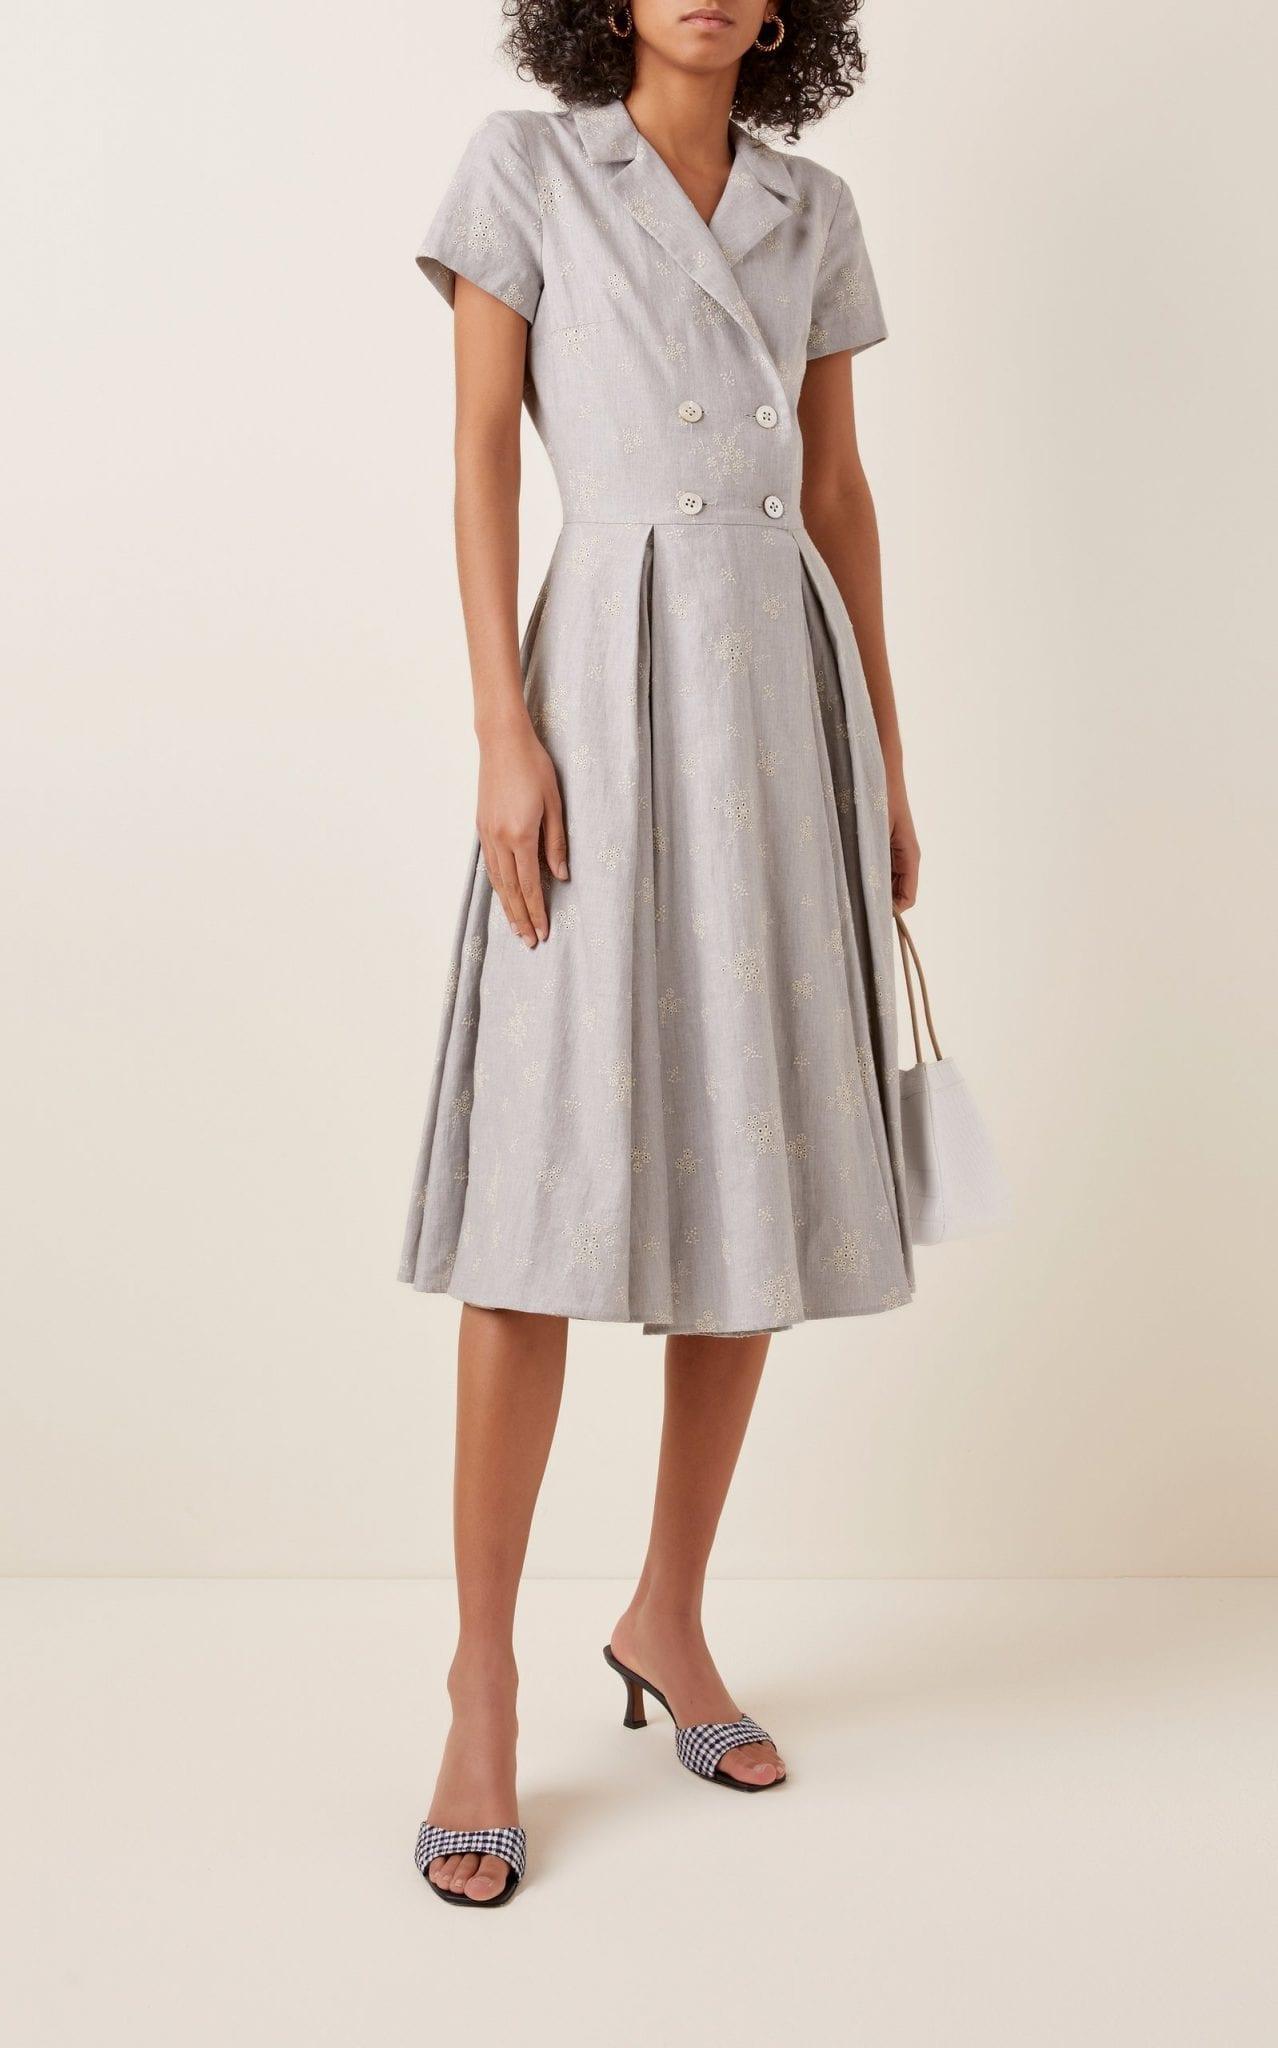 LENA HOSCHEK Triumph Belted Floral-Print Cotton Midi Dress